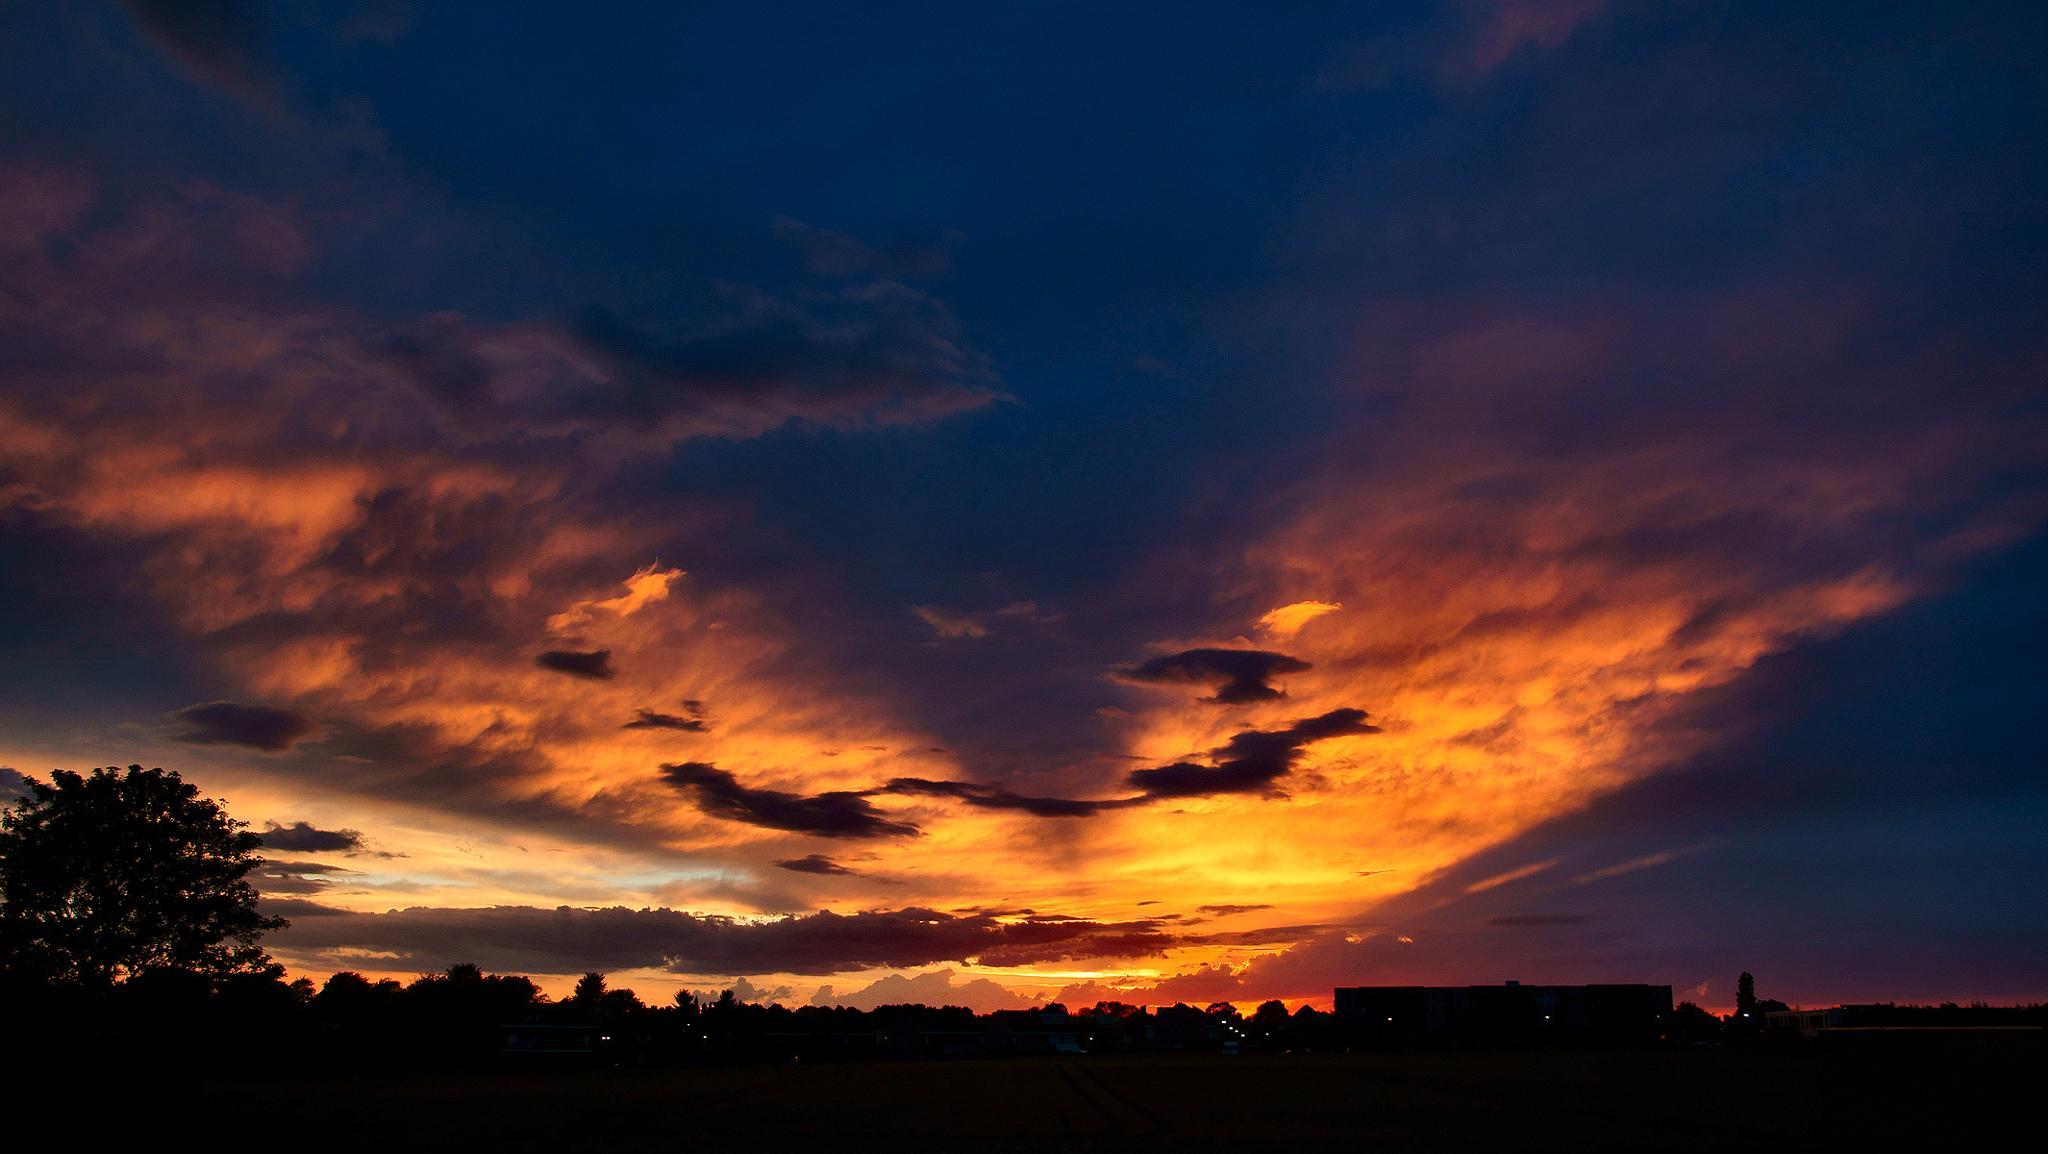 Sunset Sky by Matt H. Imaging